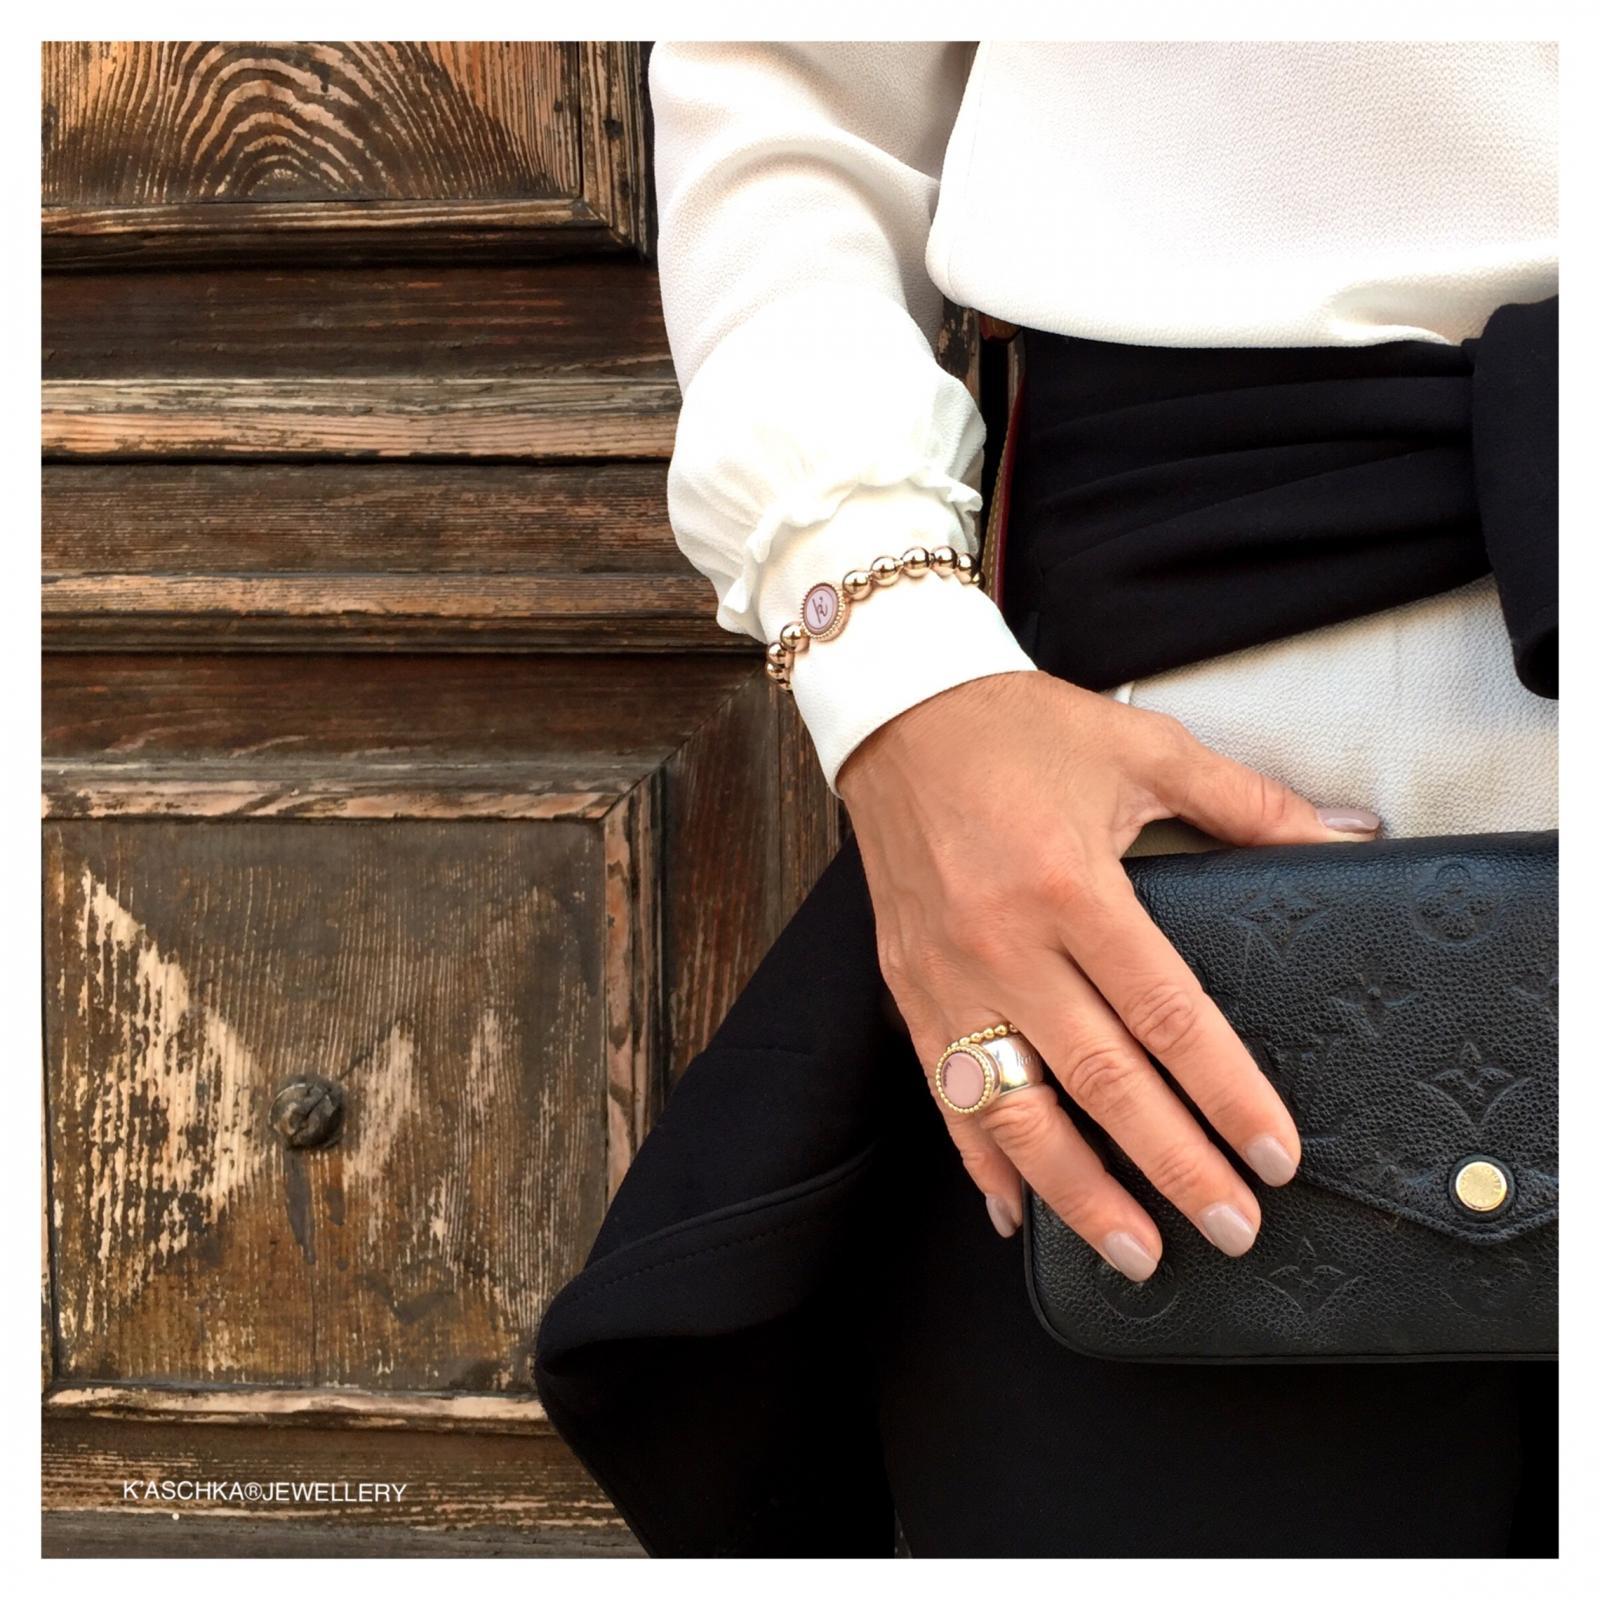 Flexibele 925 sterling zilveren wisselbare armband deluxe large Flexibele ring Massief 925 sterling zilveren wisselbare ring met 18 karaats gouden rand